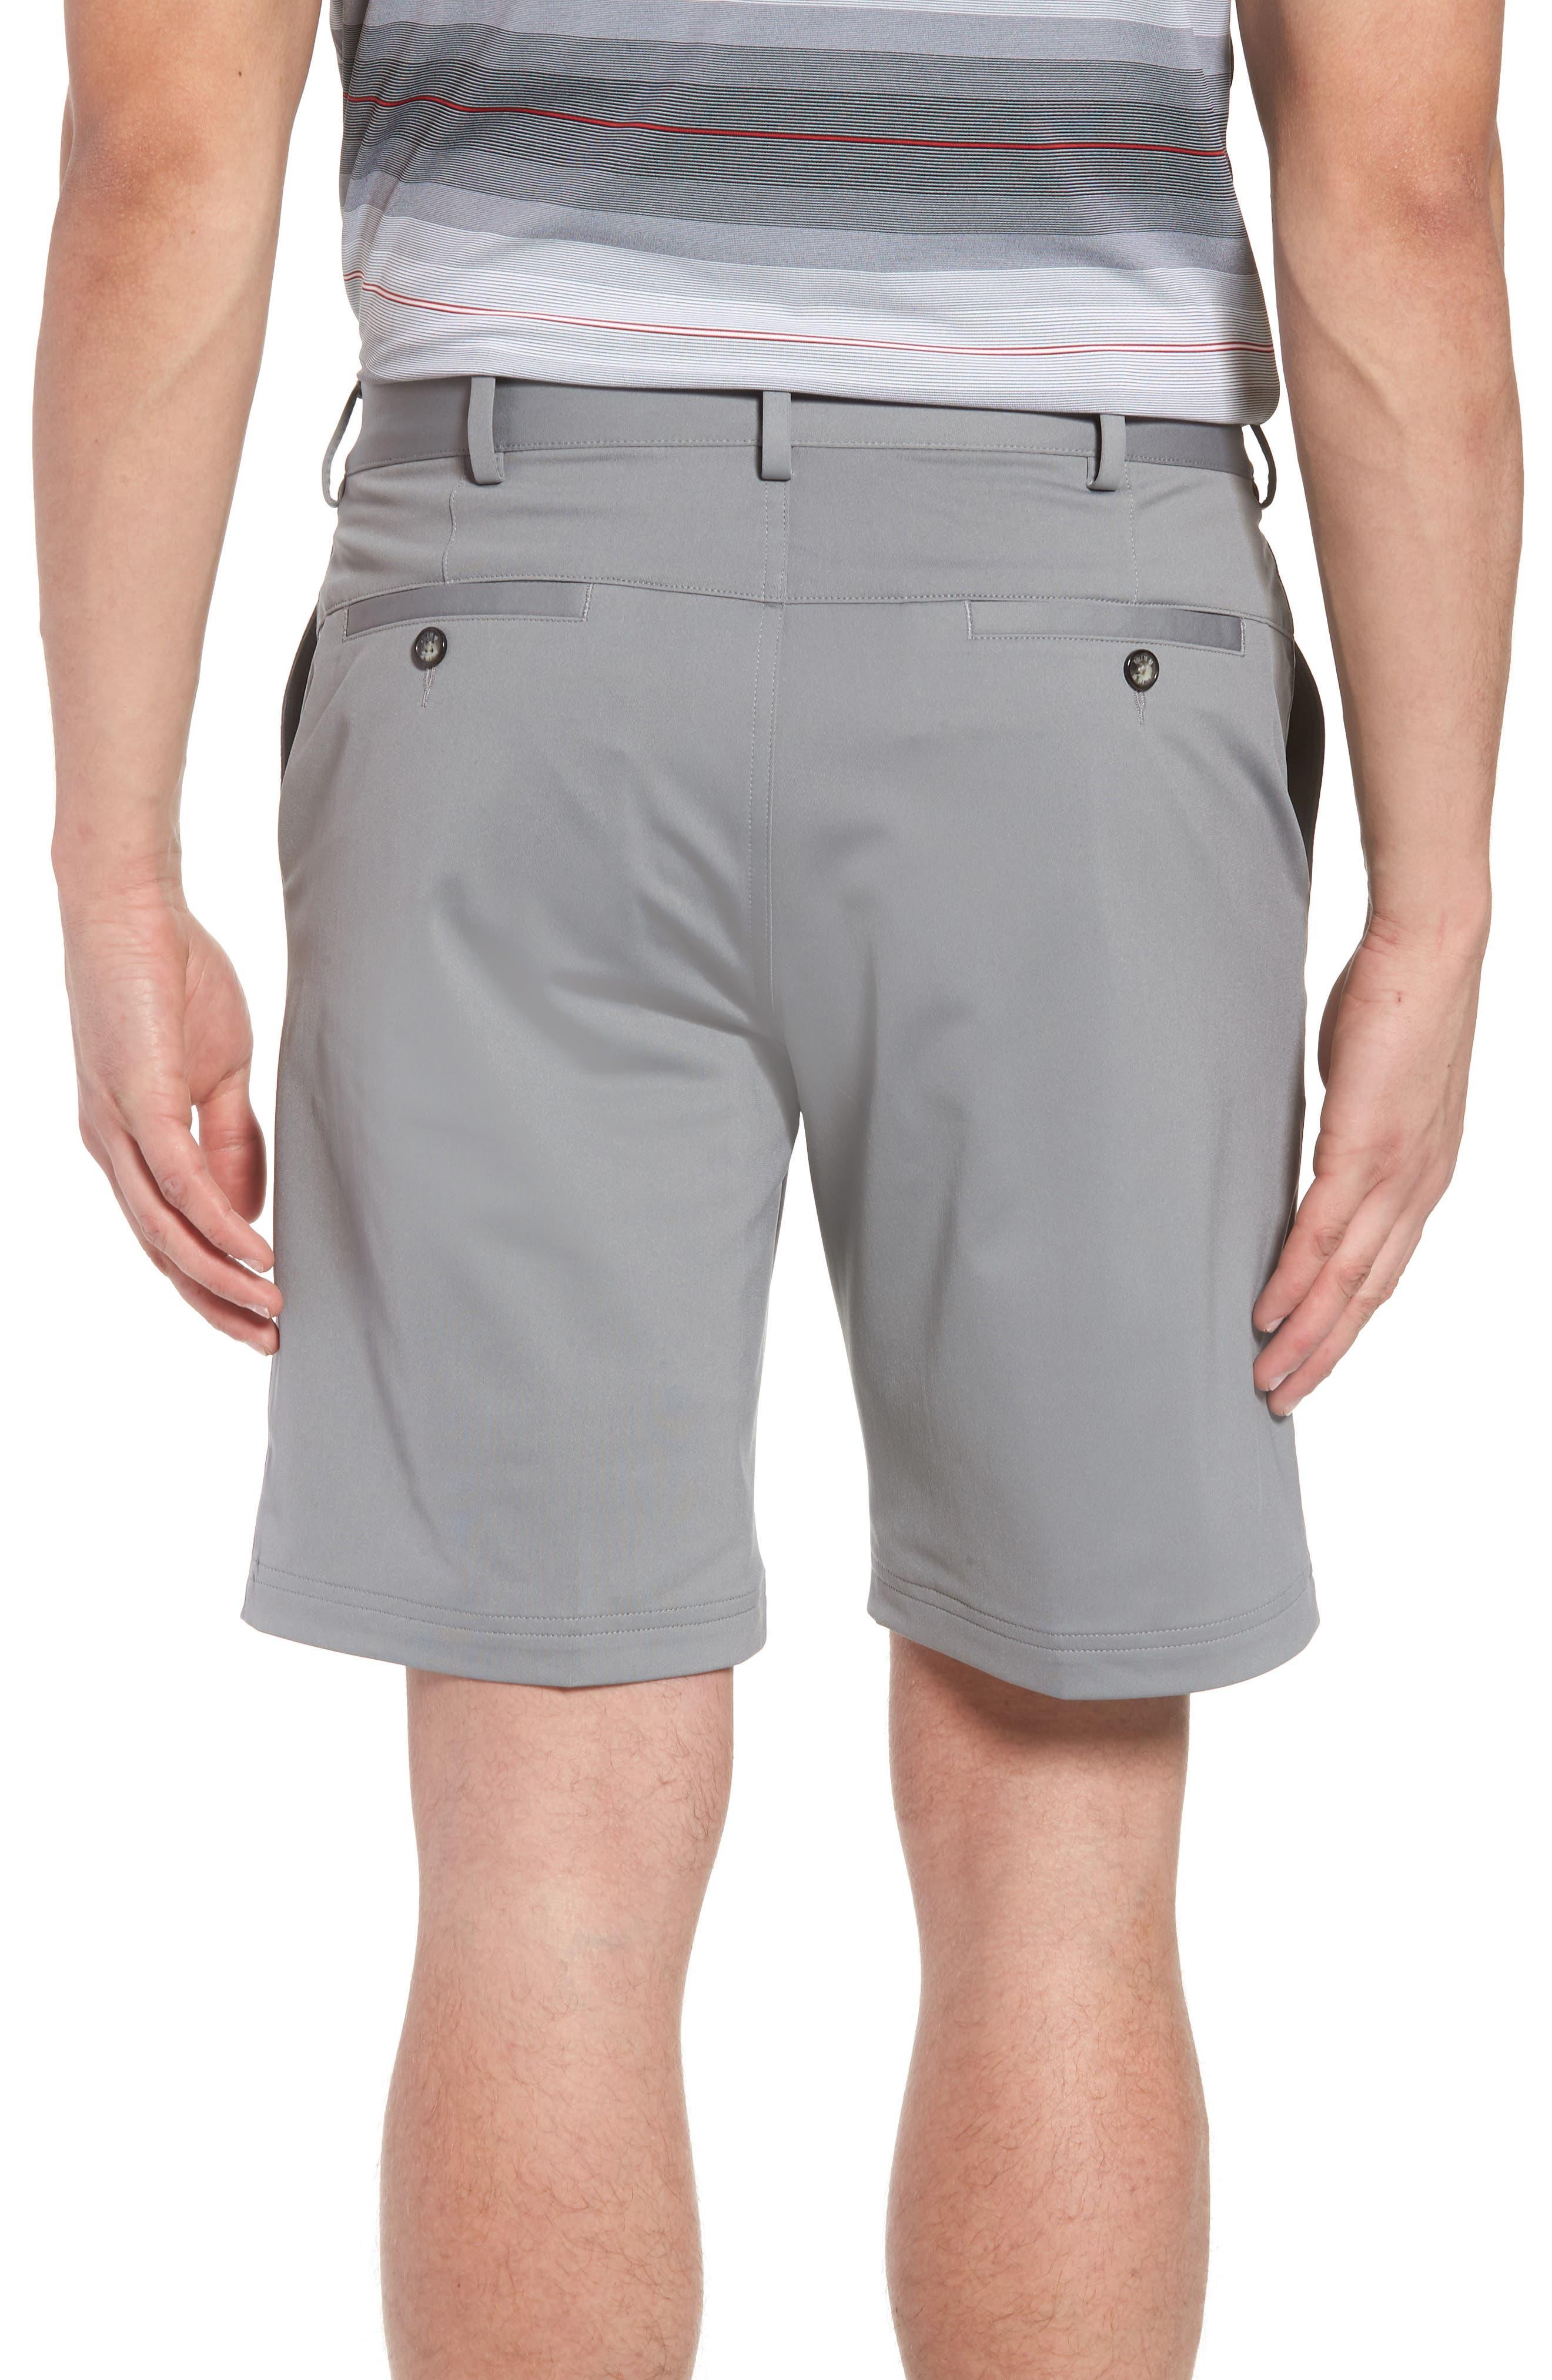 Trim Fit Tech Chino Shorts,                             Alternate thumbnail 2, color,                             Graphite Heather